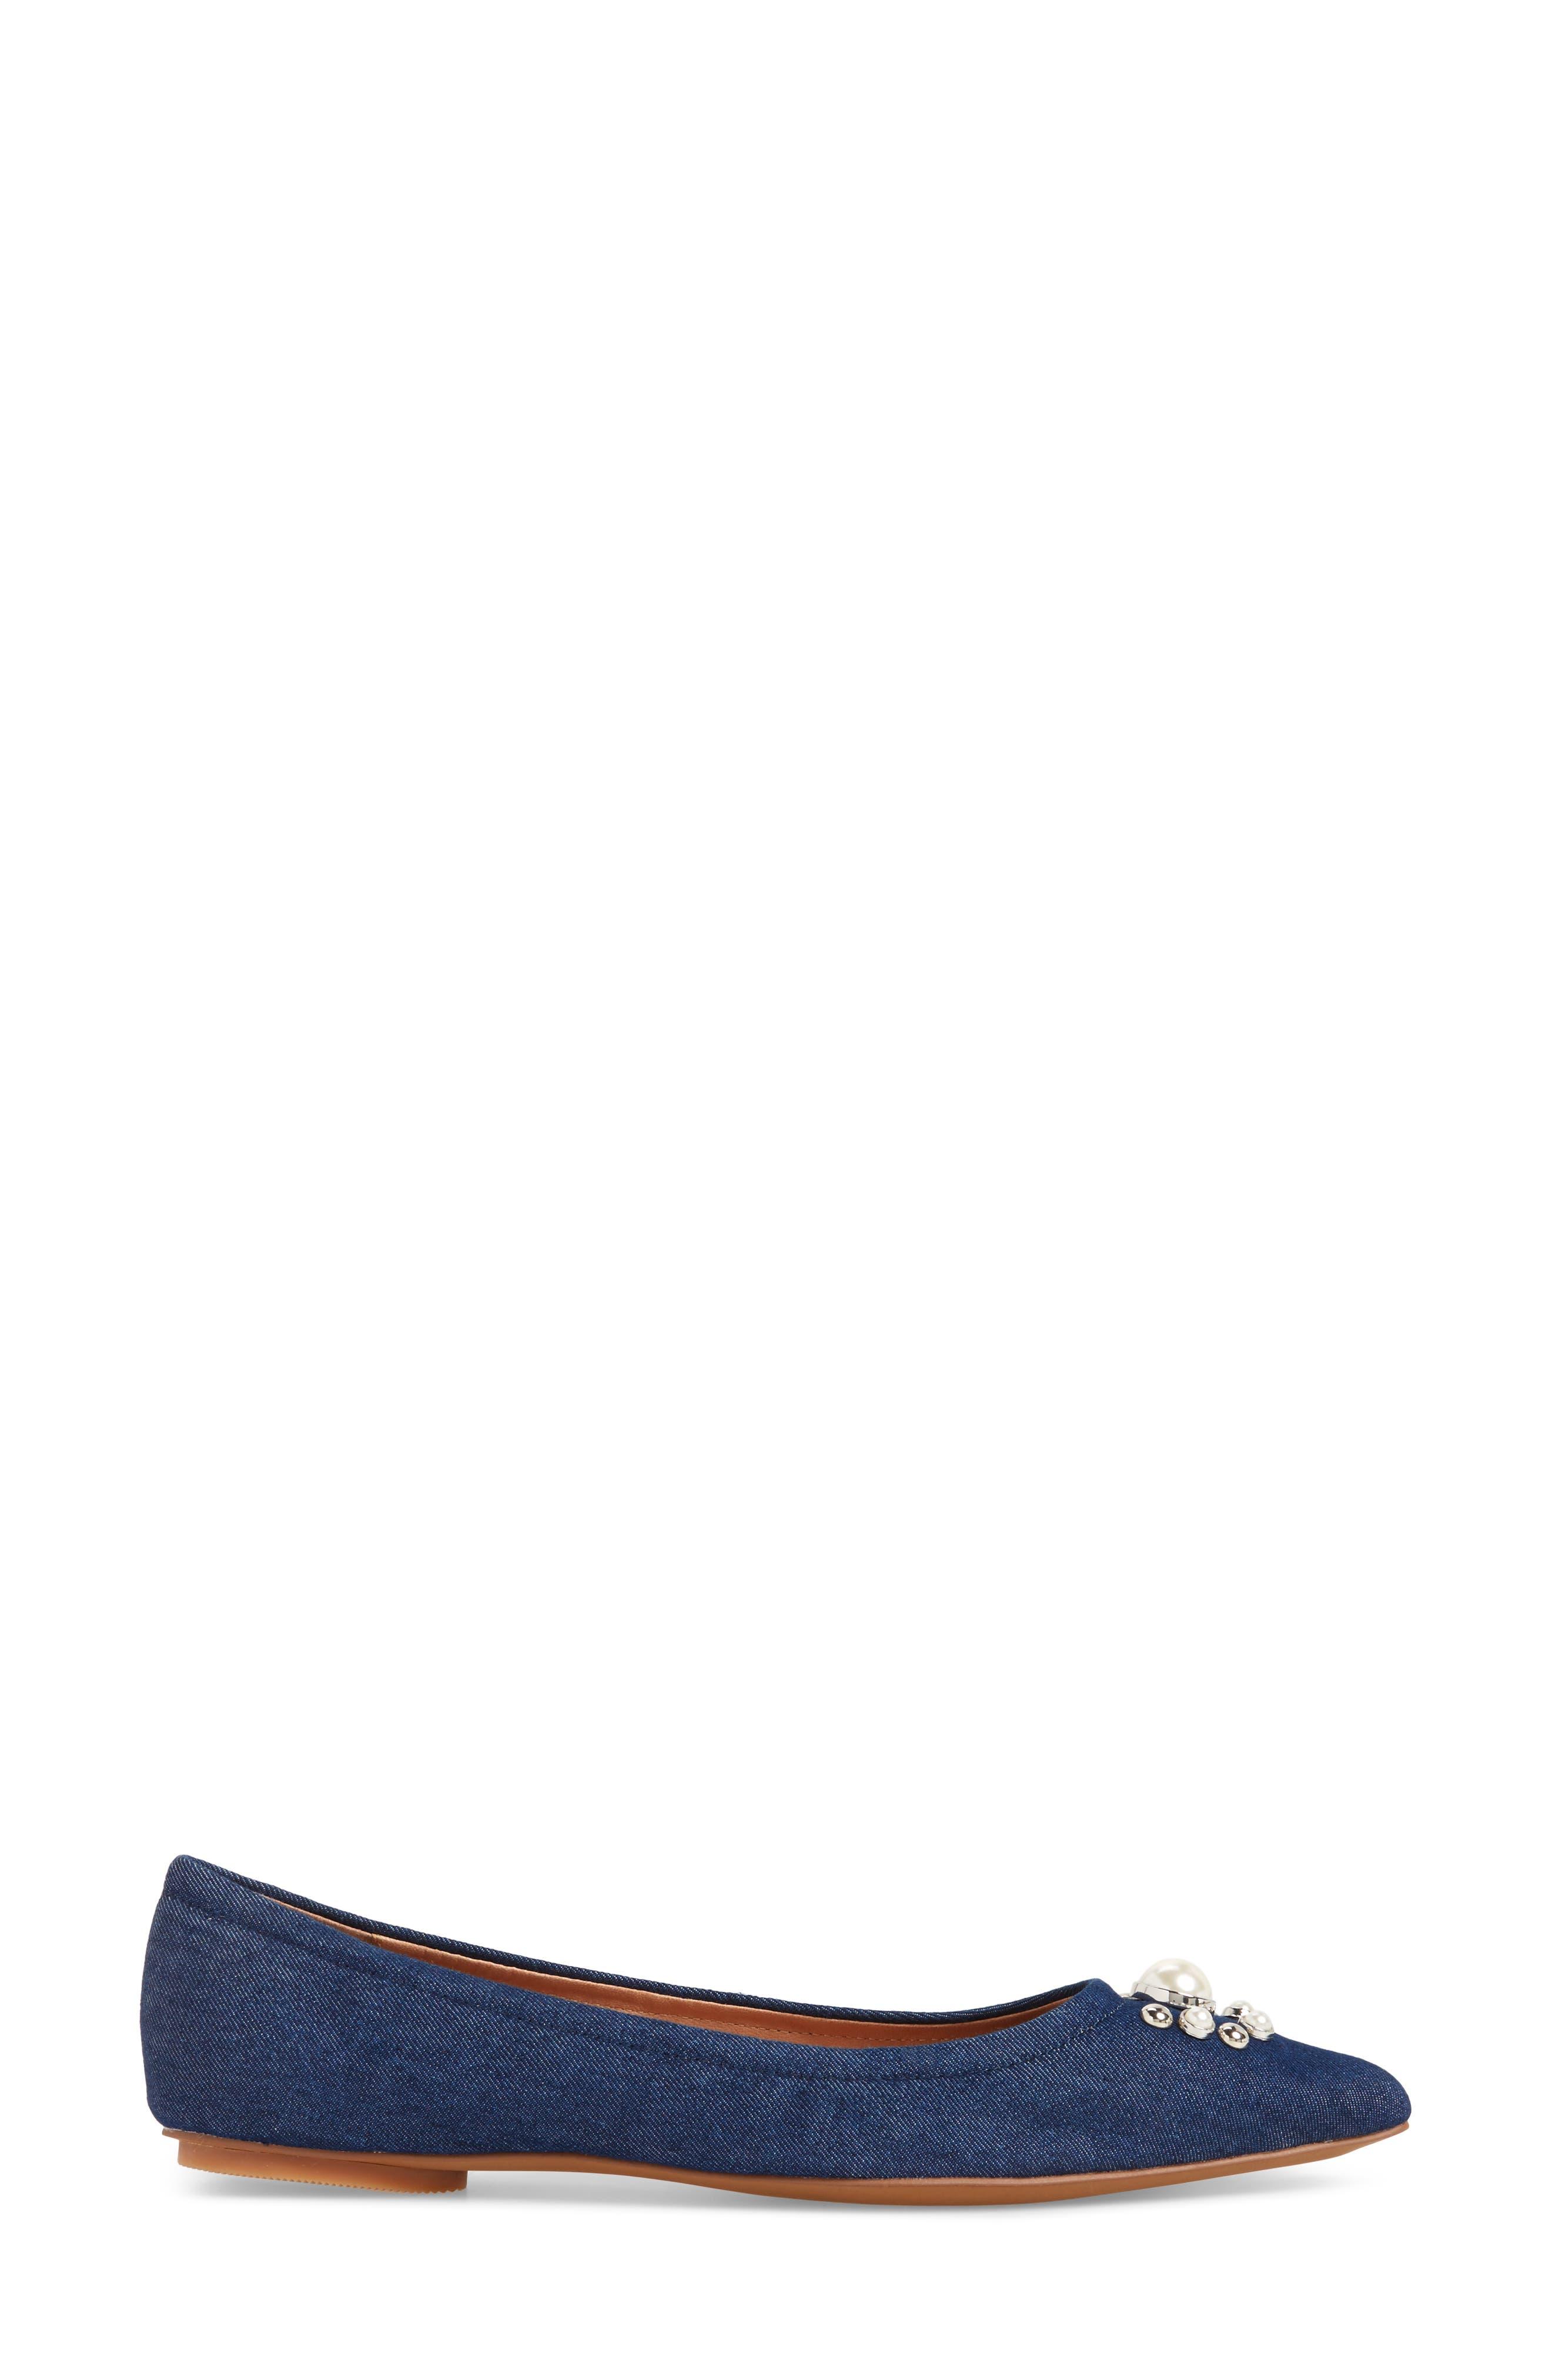 Nadia Embellished Pointy Toe Flat,                             Alternate thumbnail 3, color,                             NAVY DENIM FABRIC